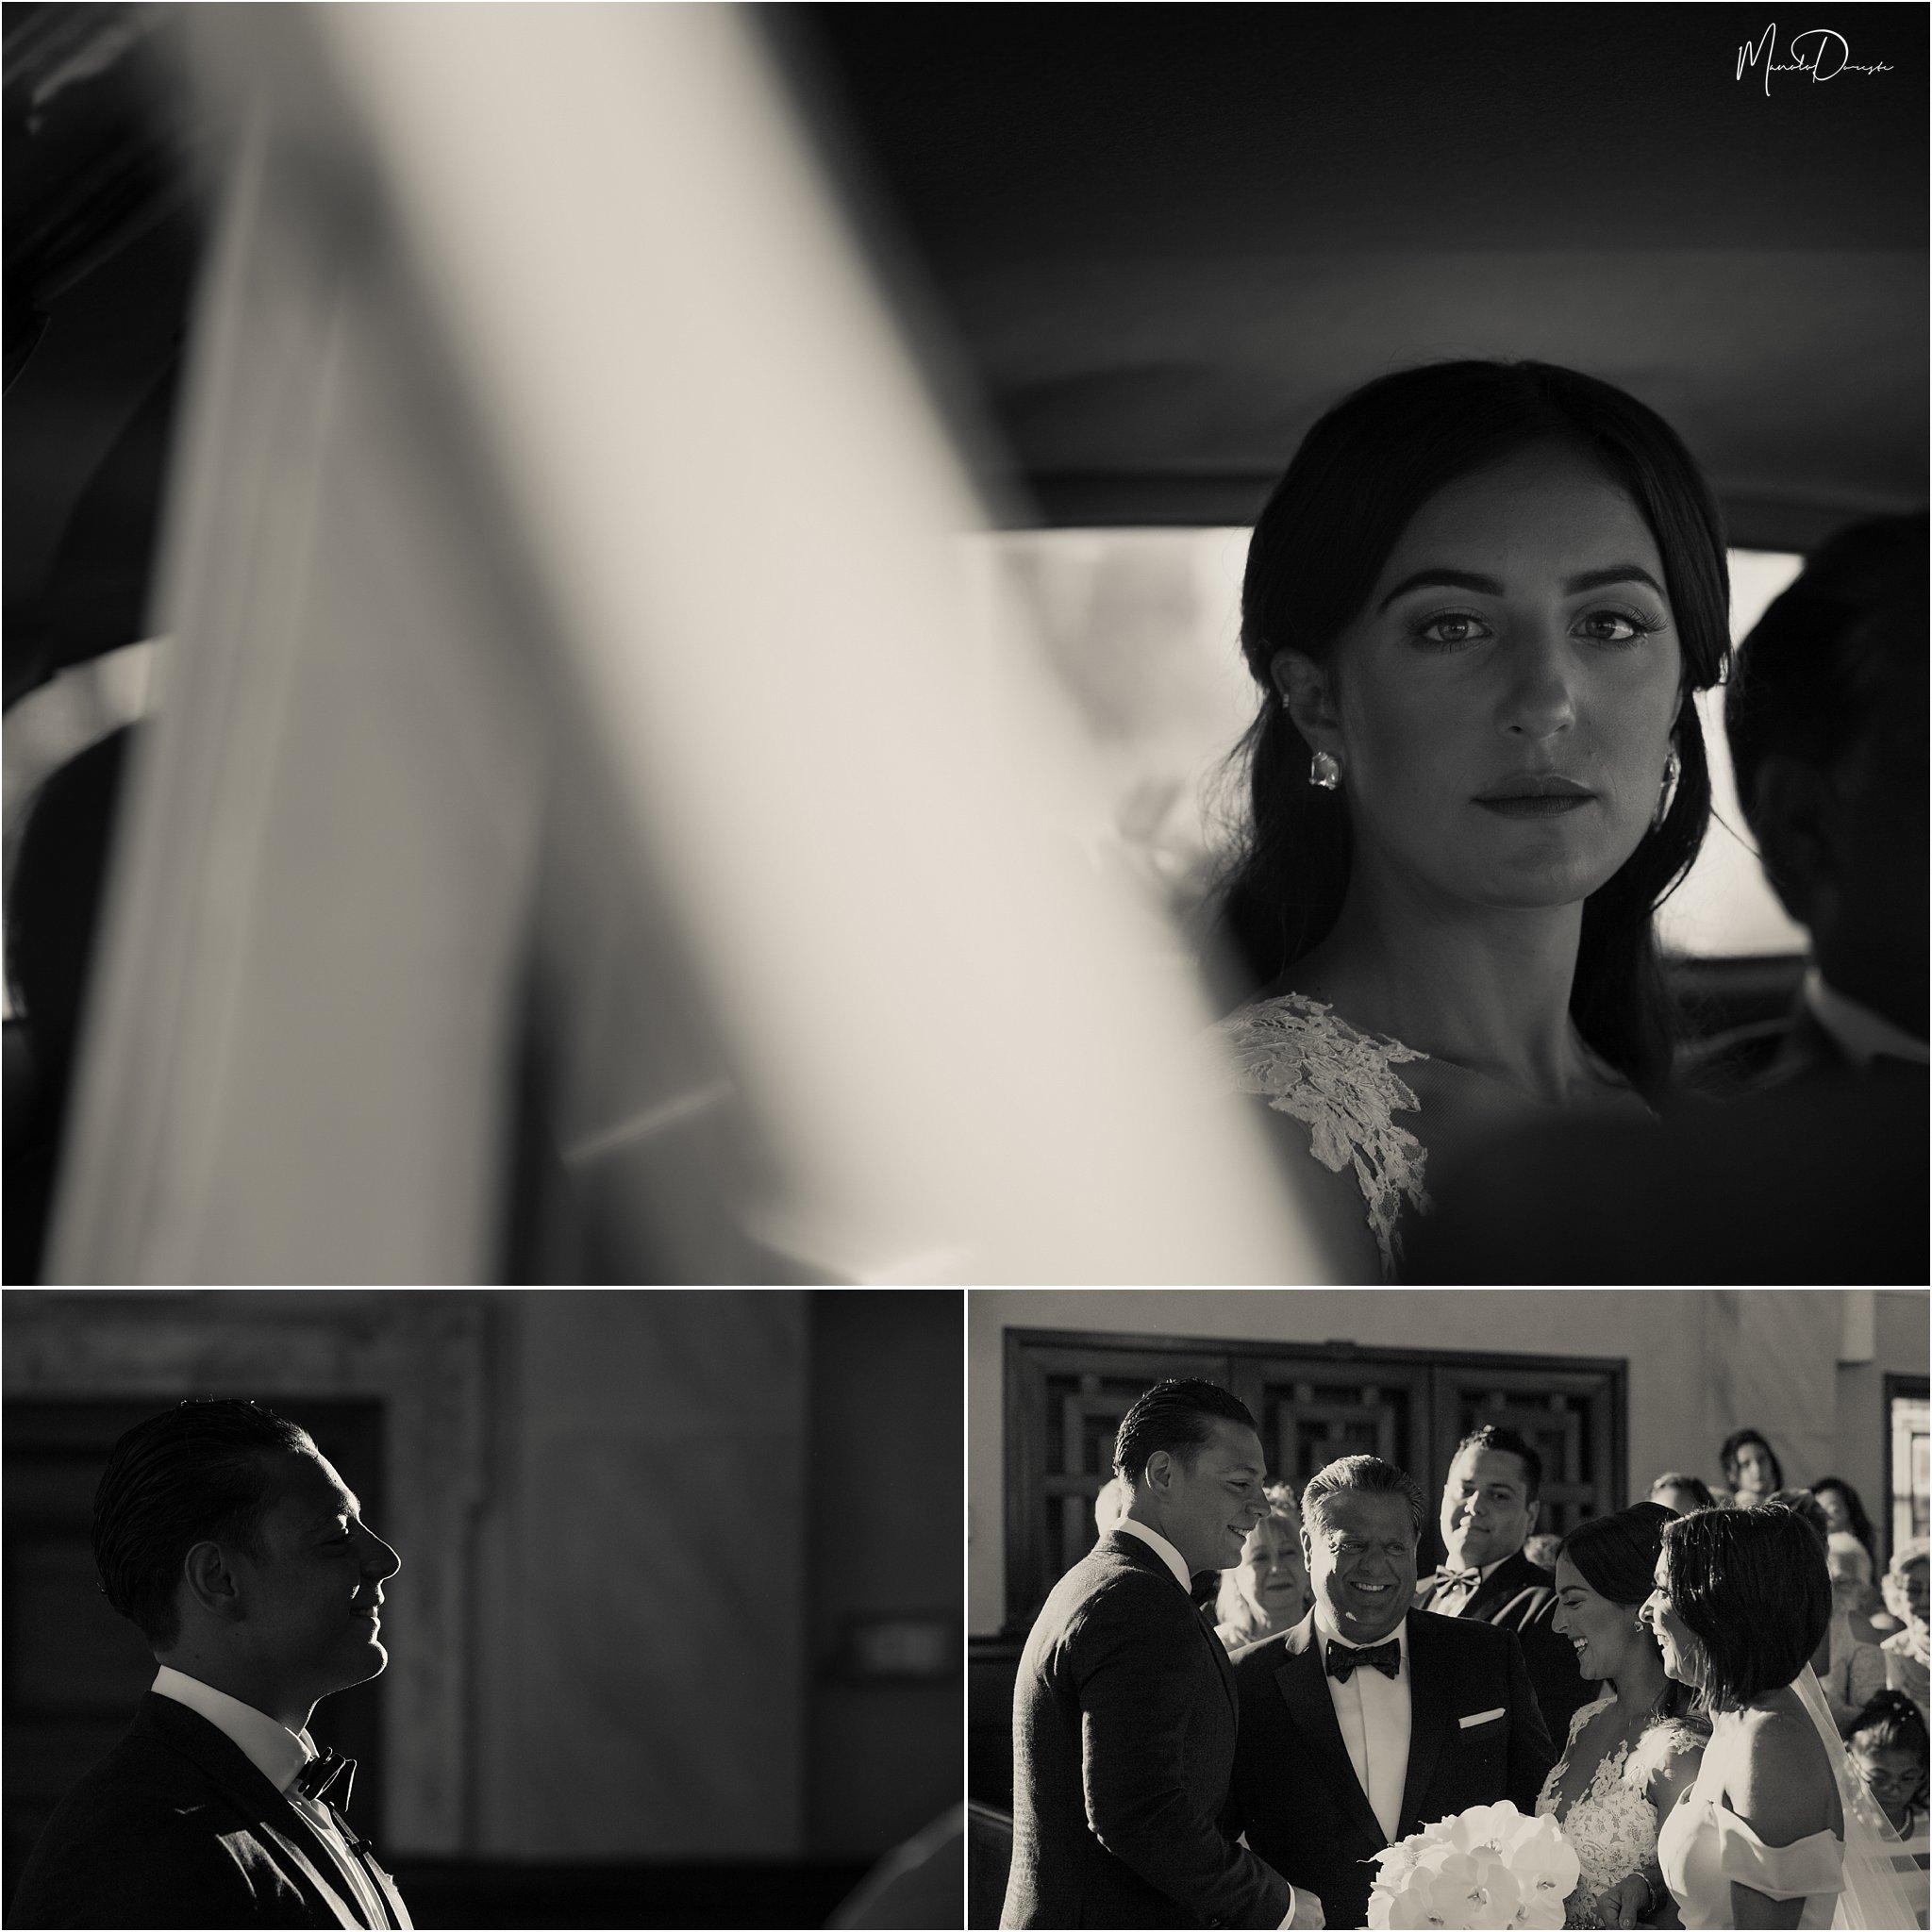 0320_ManoloDoreste_InFocusStudios_Wedding_Family_Photography_Miami_MiamiPhotographer.jpg